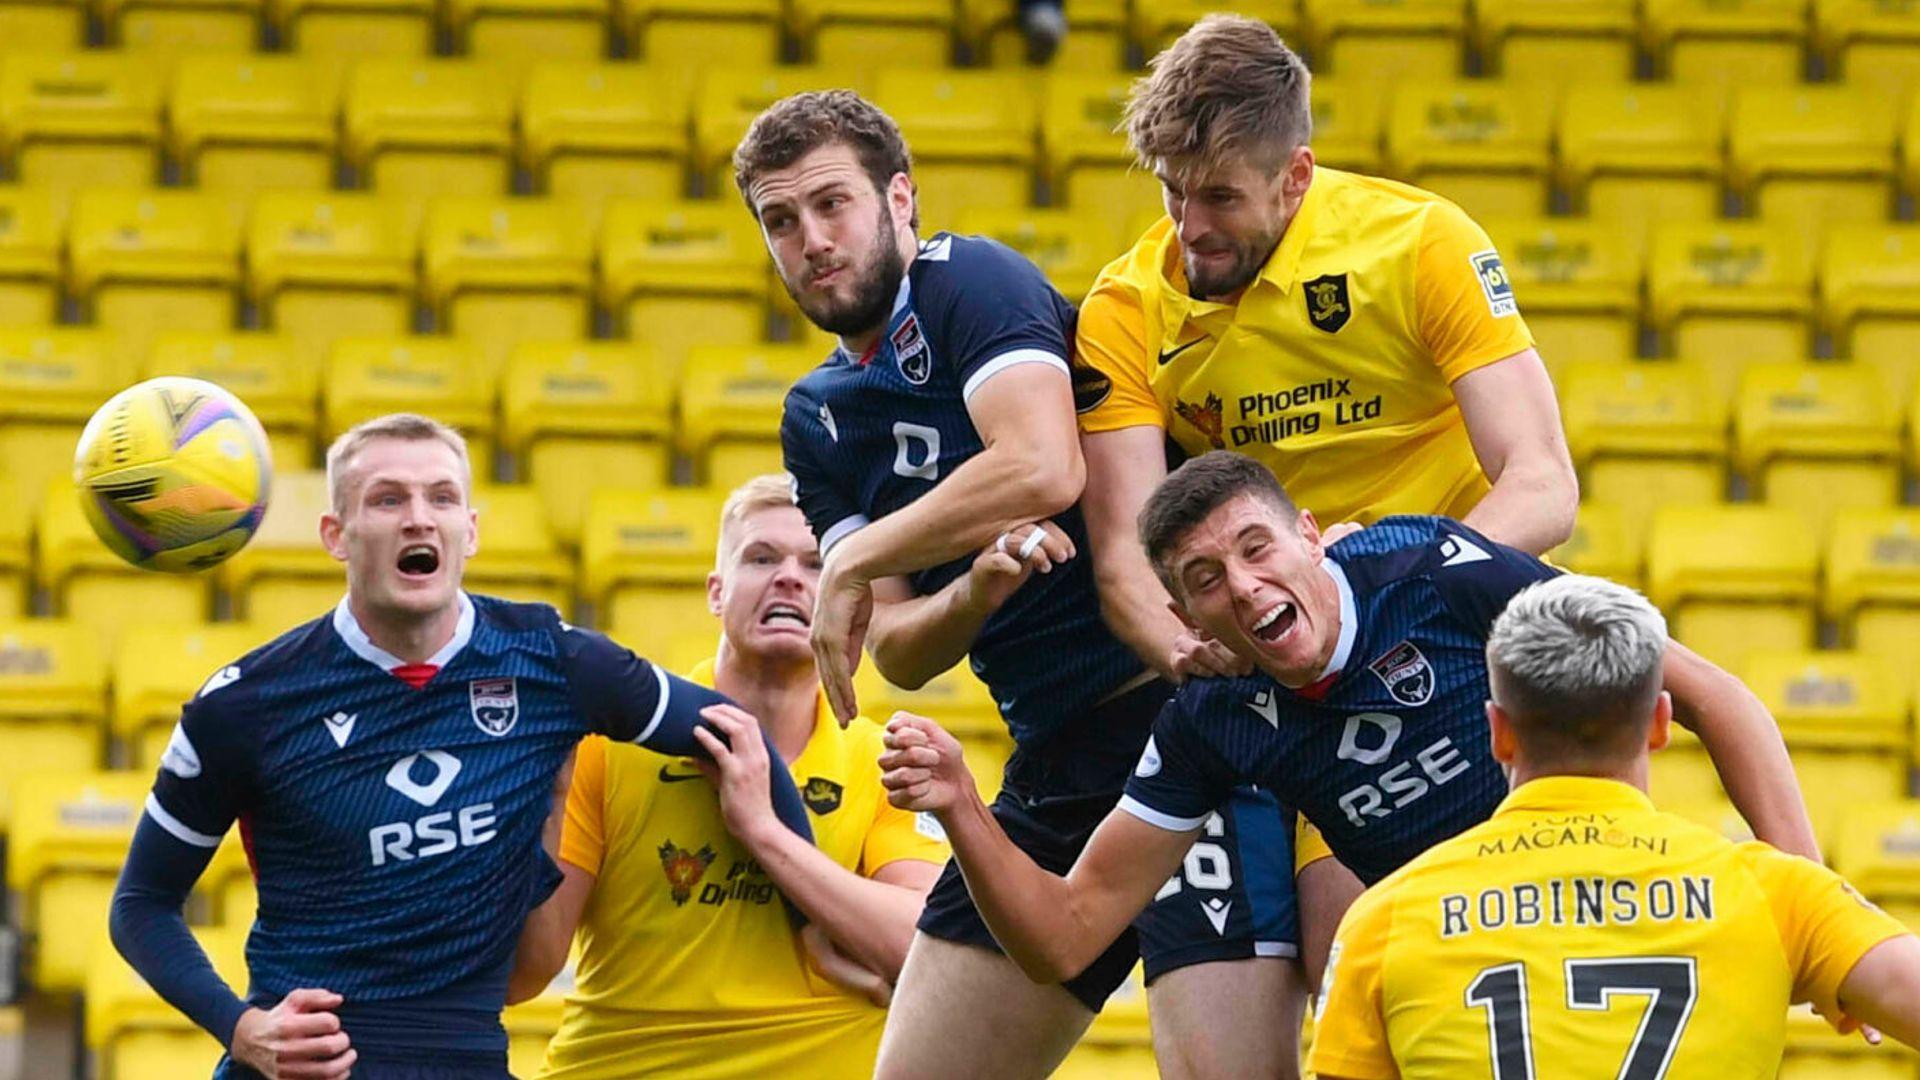 Big win for Killie, Livingston and St Johnstone also win recap